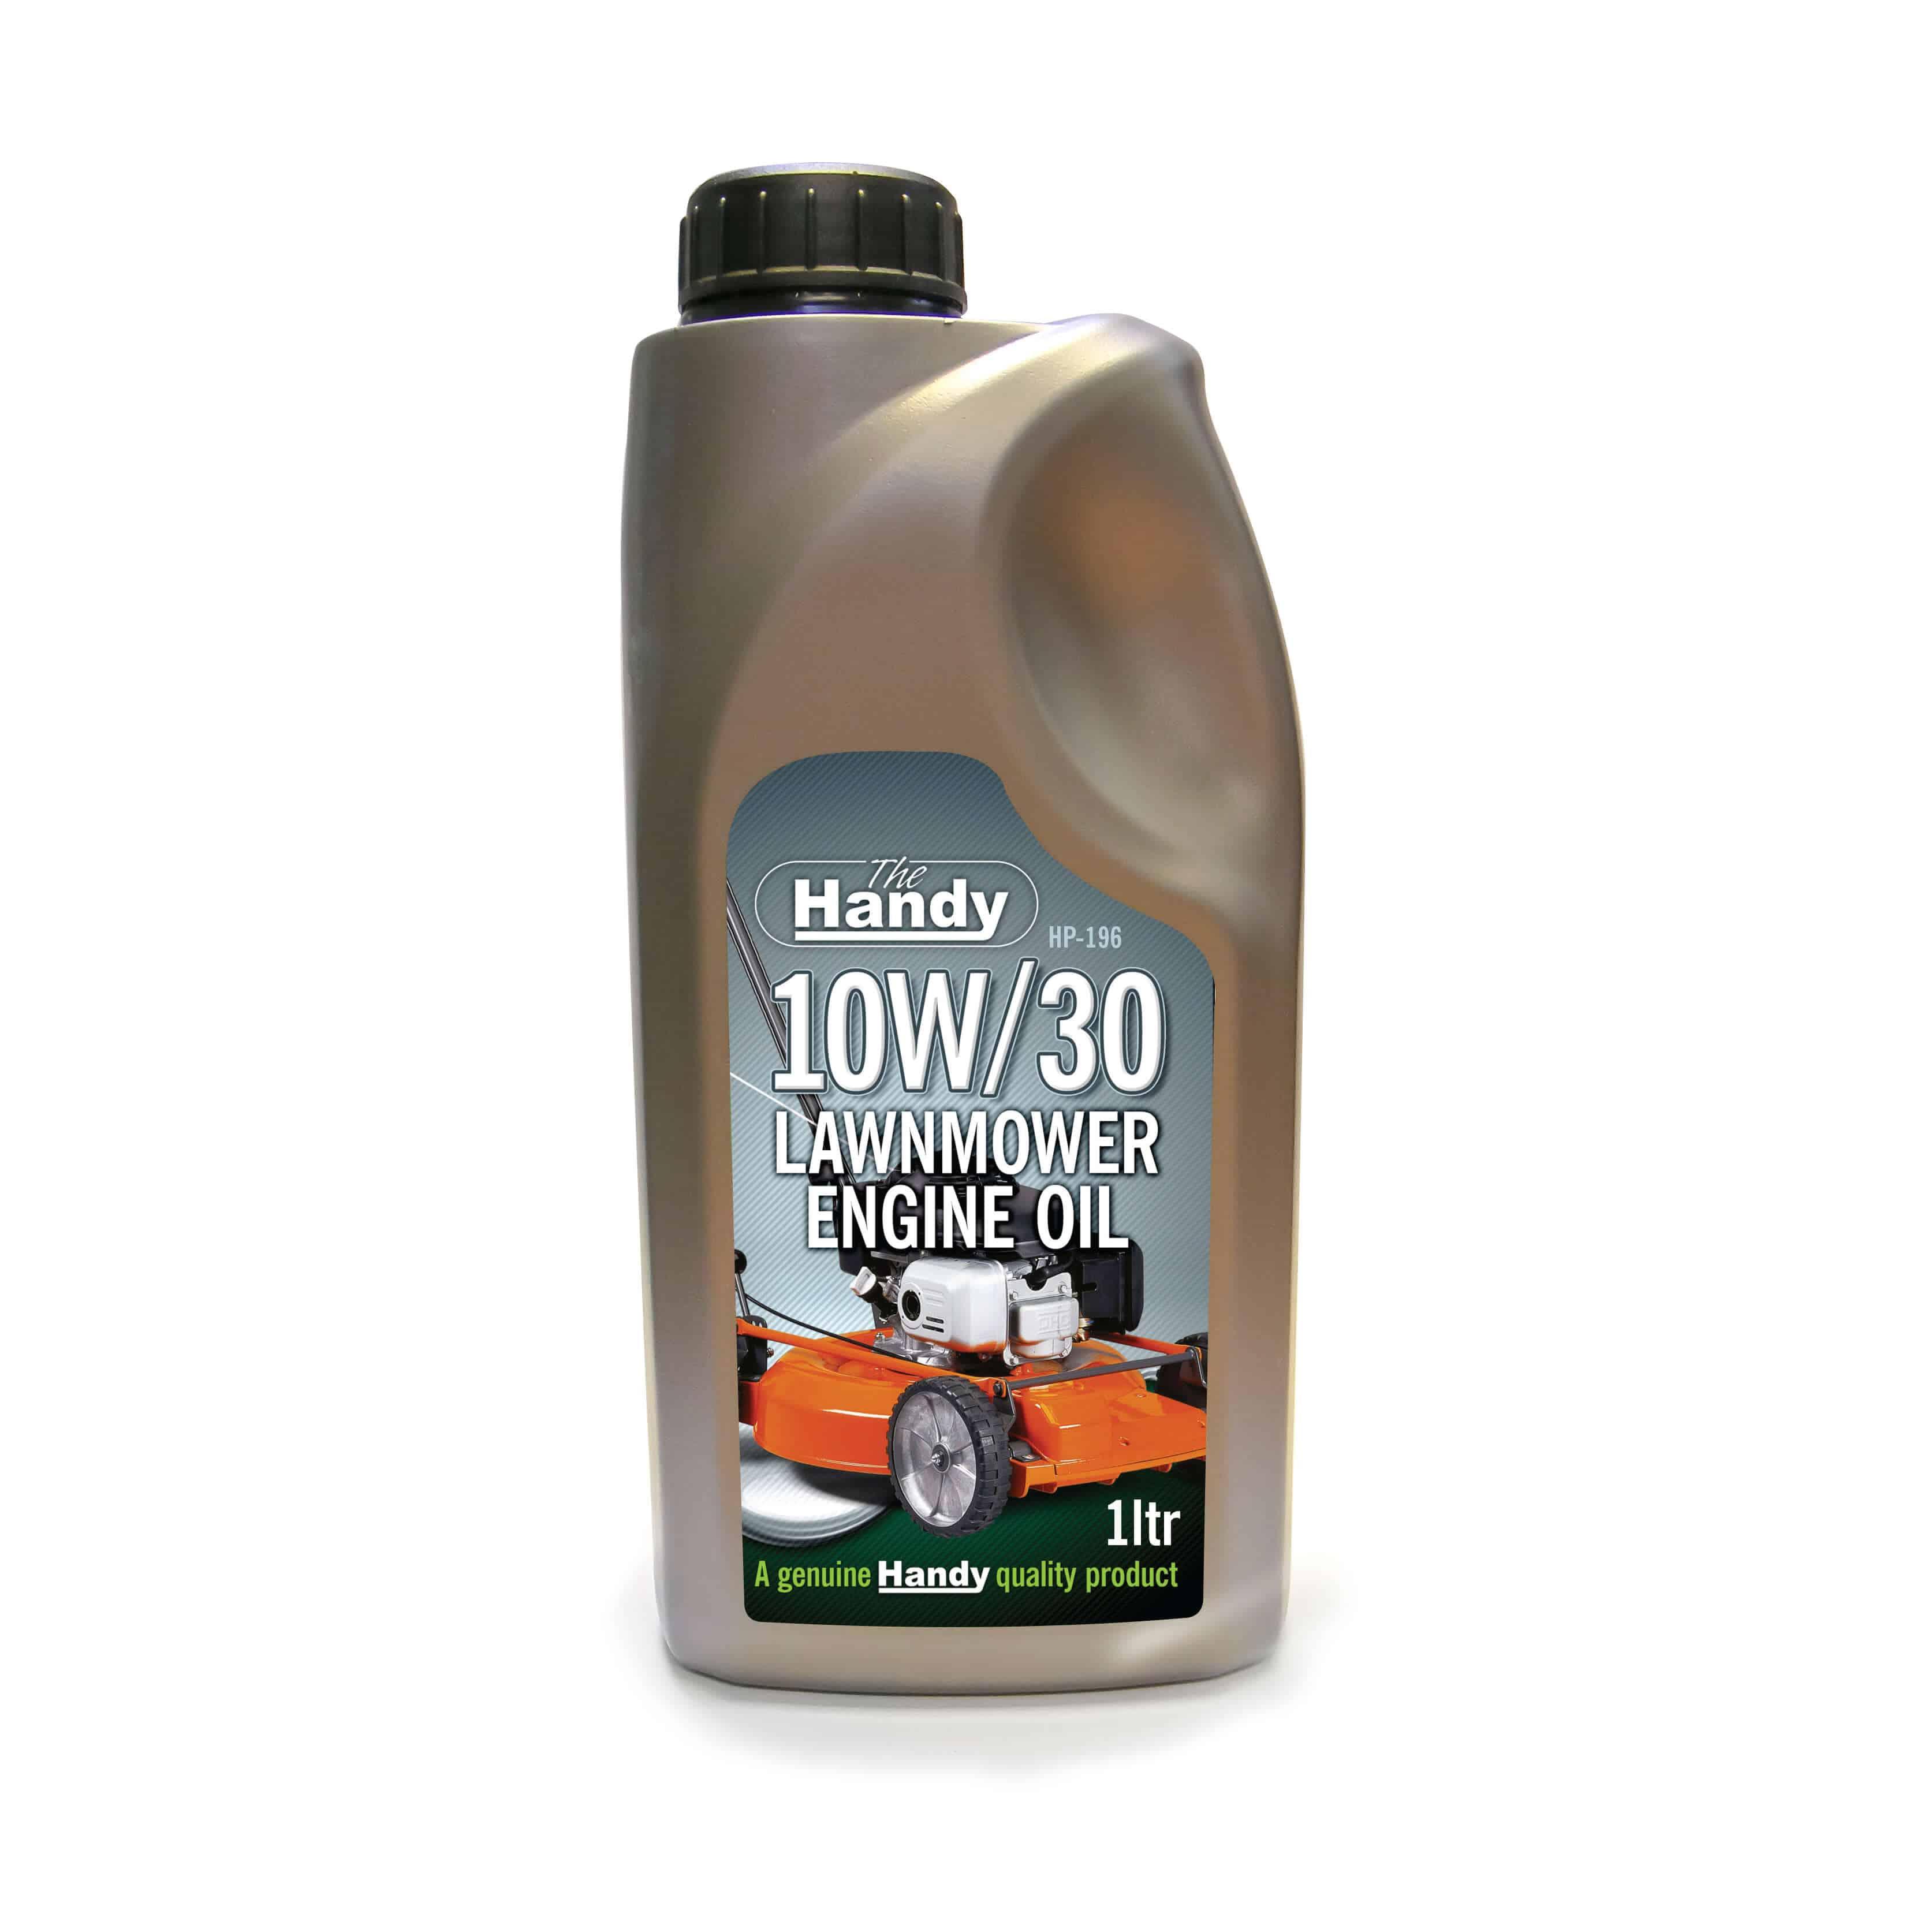 1 Ltr 10w 30 Lawnmower Engine Oil Handy Garden Machinery